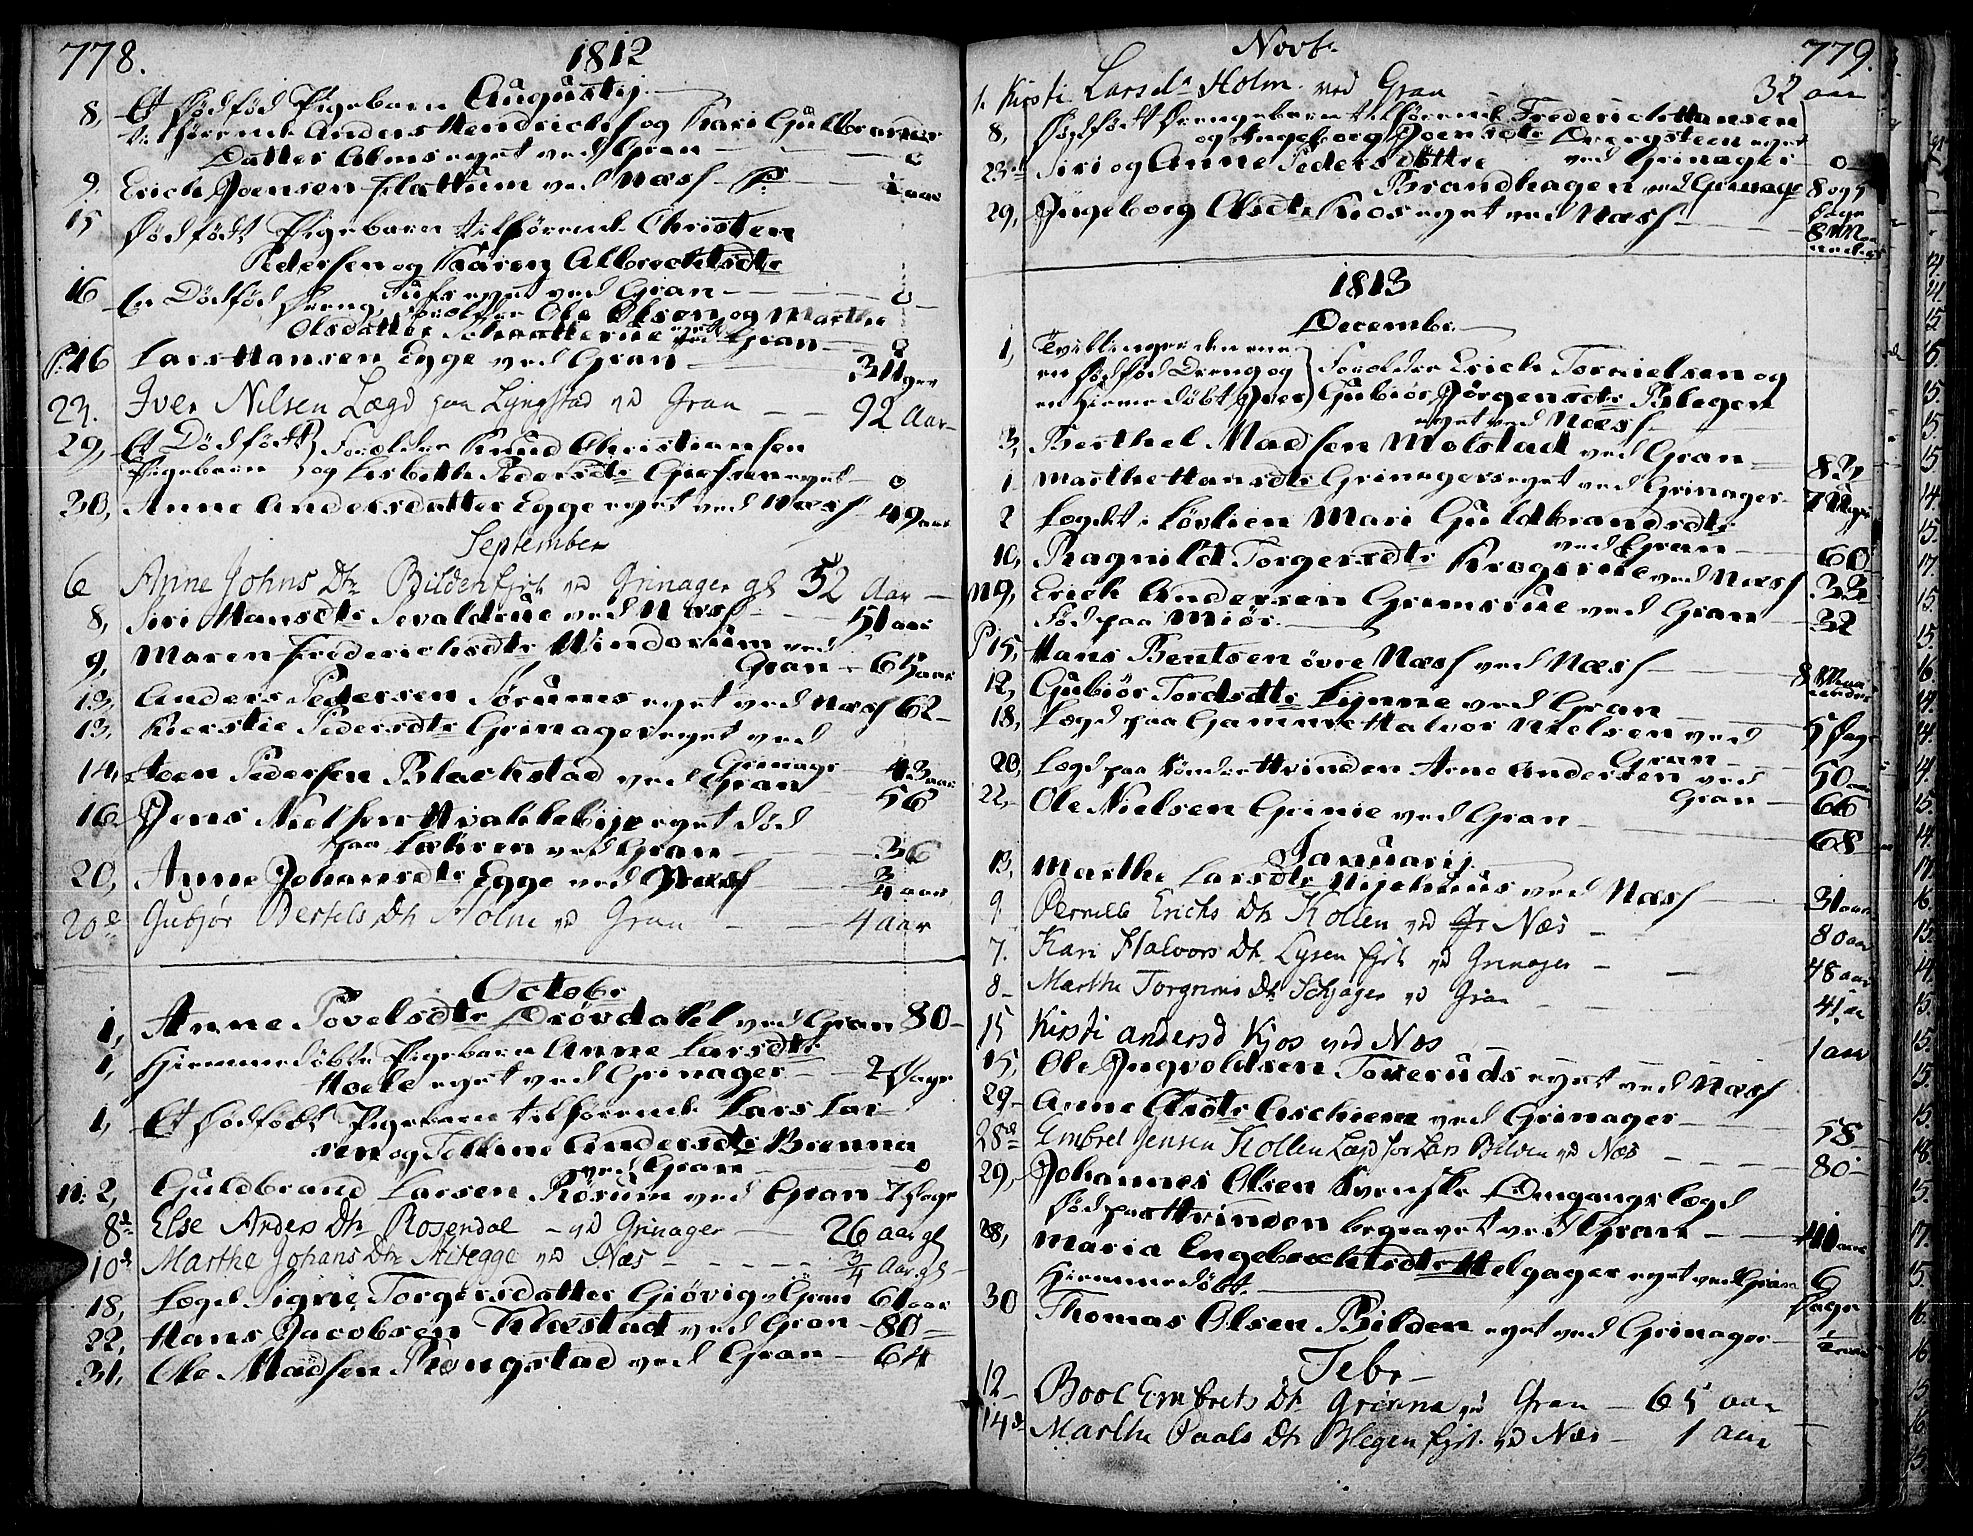 SAH, Gran prestekontor, Ministerialbok nr. 6, 1787-1824, s. 778-779